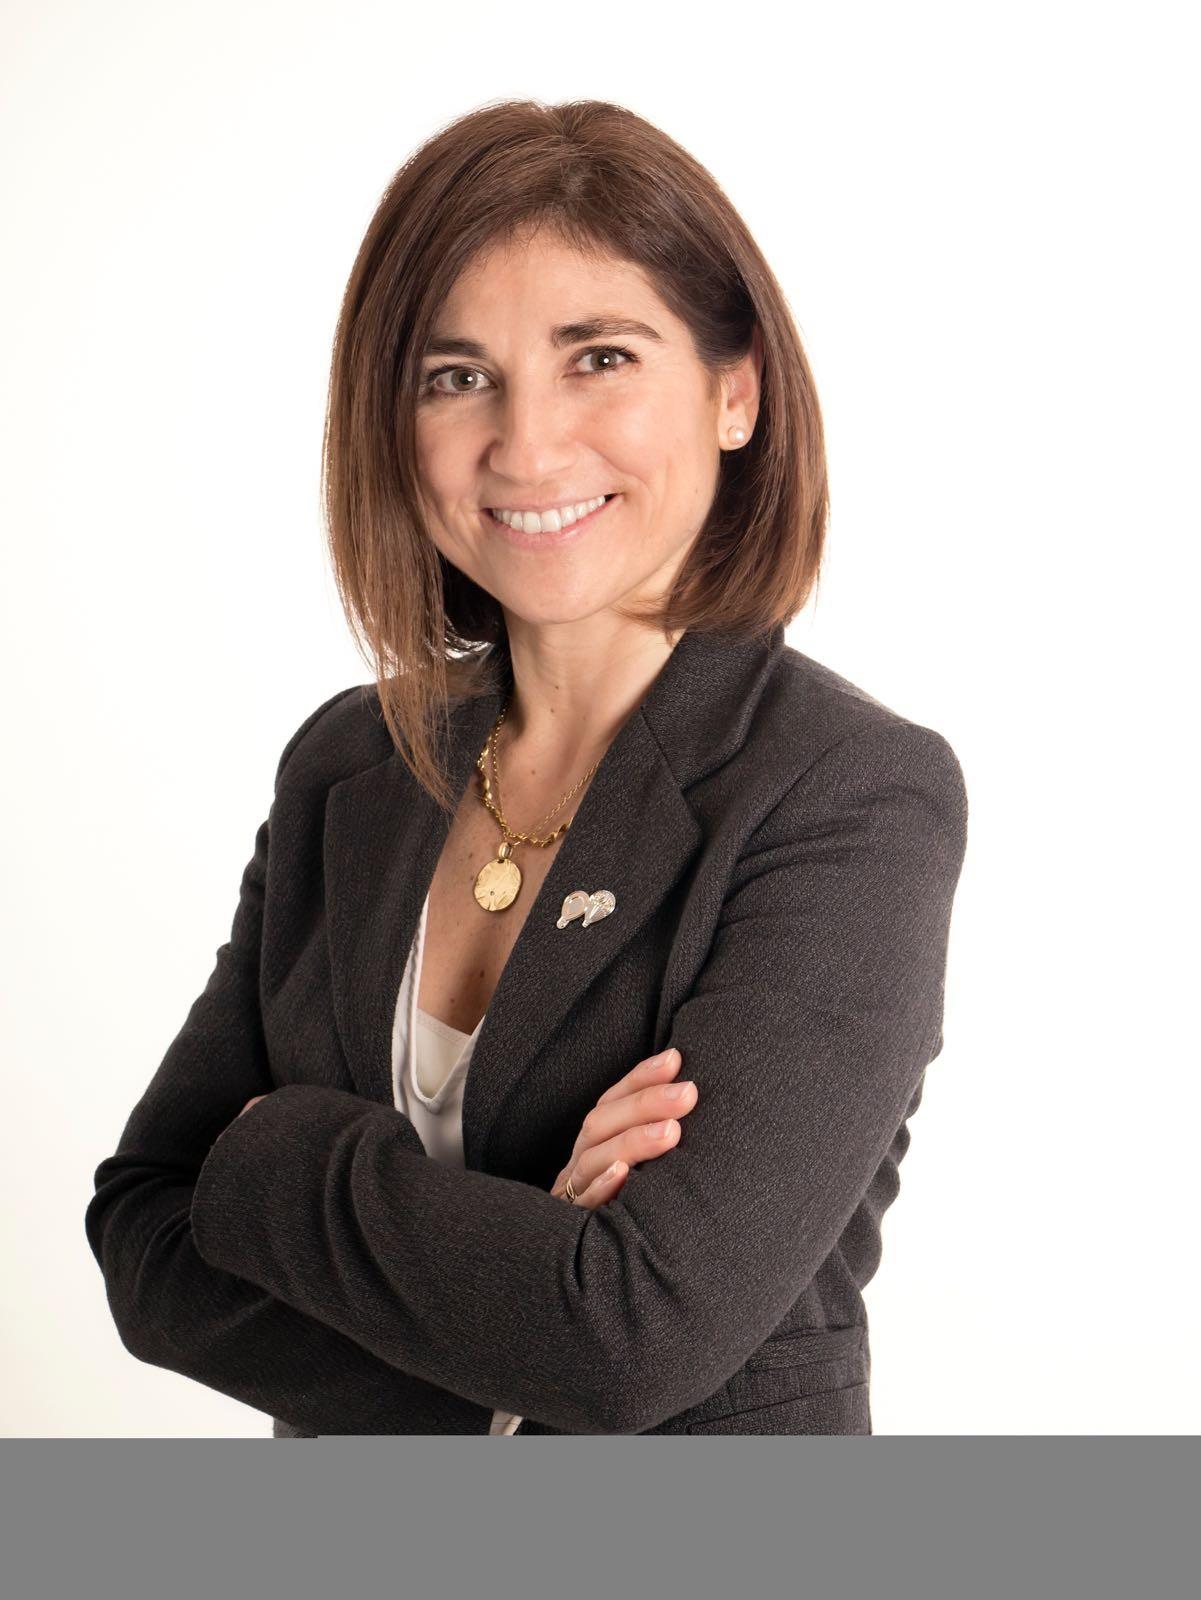 Lola Fernandez Moreno